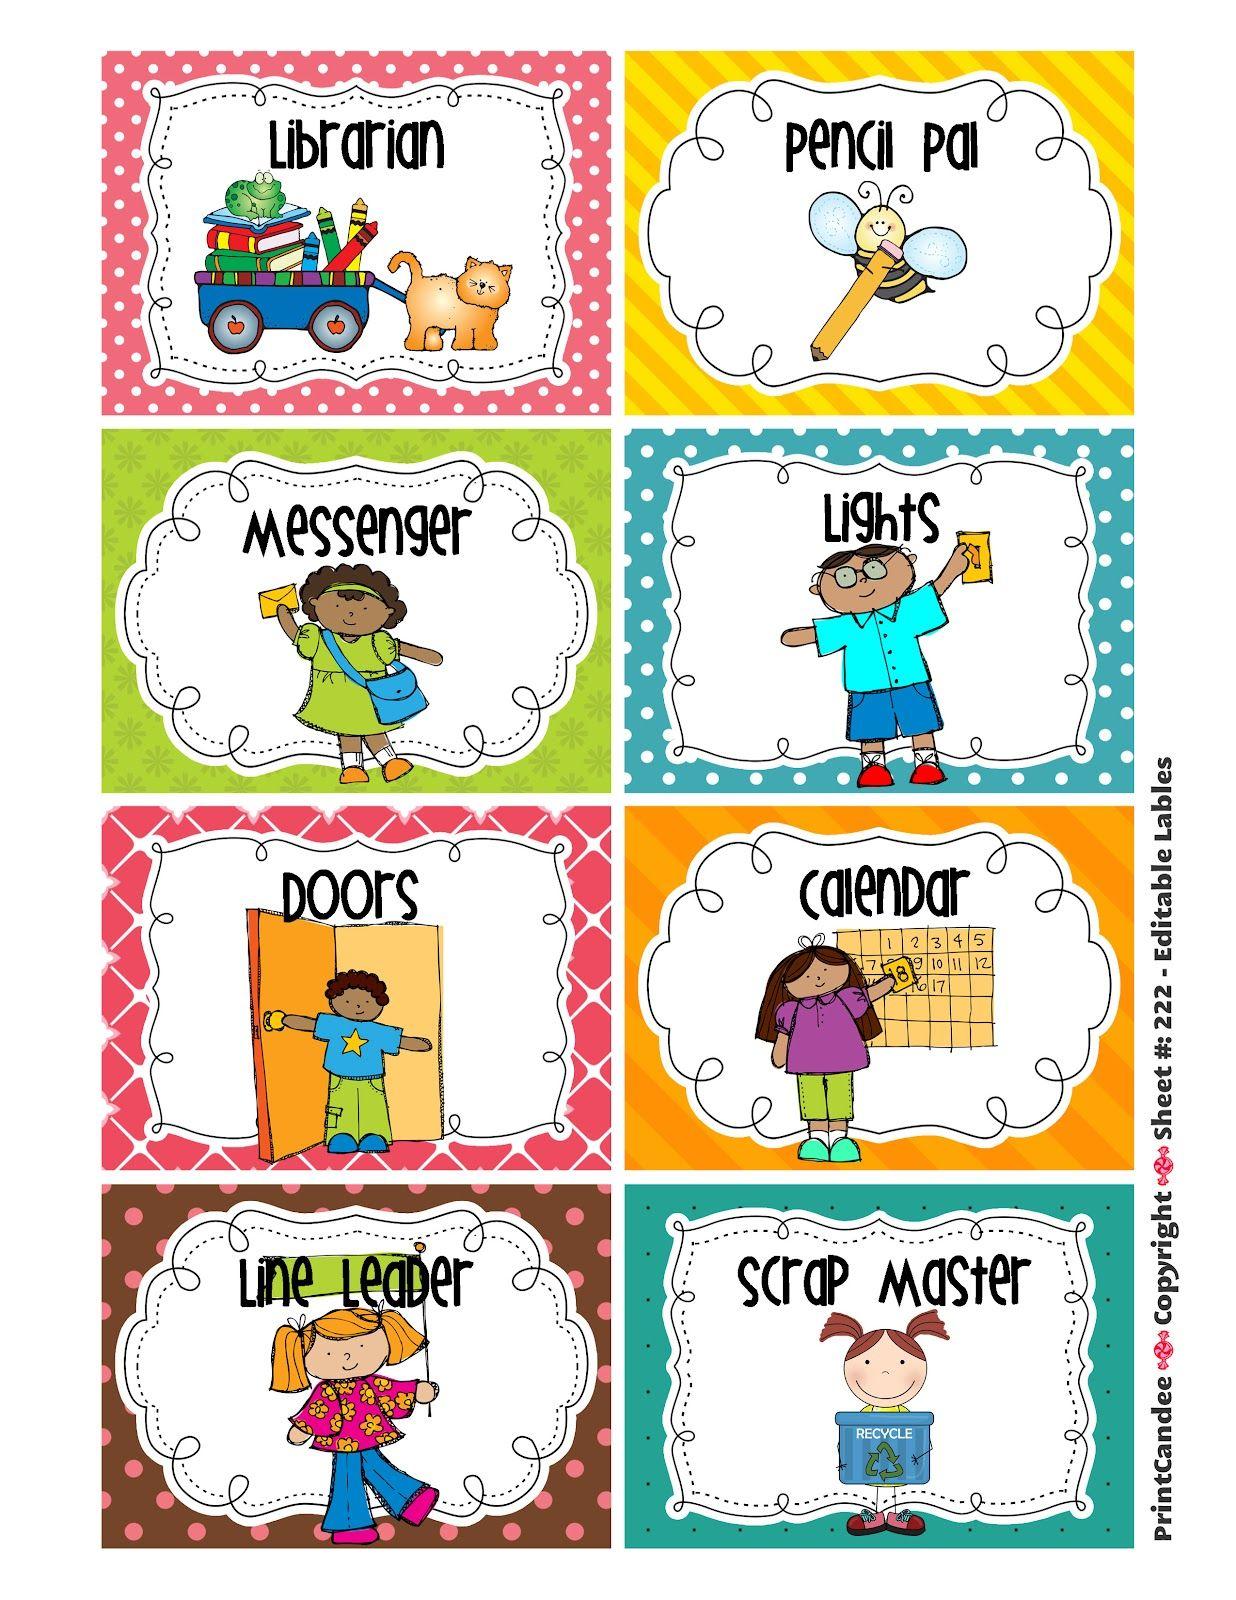 Chore clipart classroom, Chore classroom Transparent FREE.